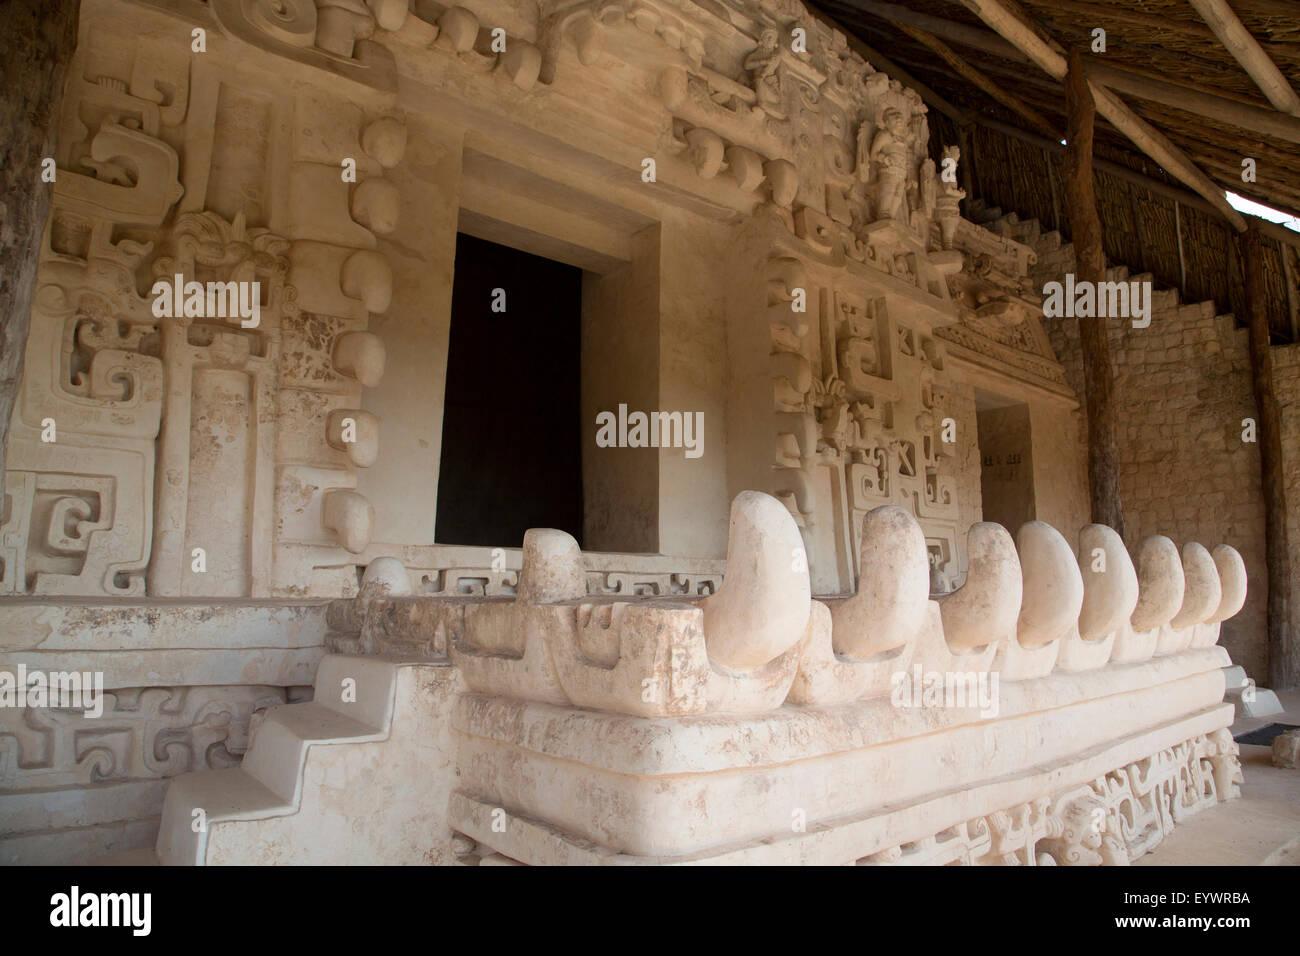 Stucco sculpture, Monster Mouth, The Tomb of Ukit Kan Lek Tok (Mayan Ruler), The Acropolis, Ek Balam, Yucatan, Mexico - Stock Image